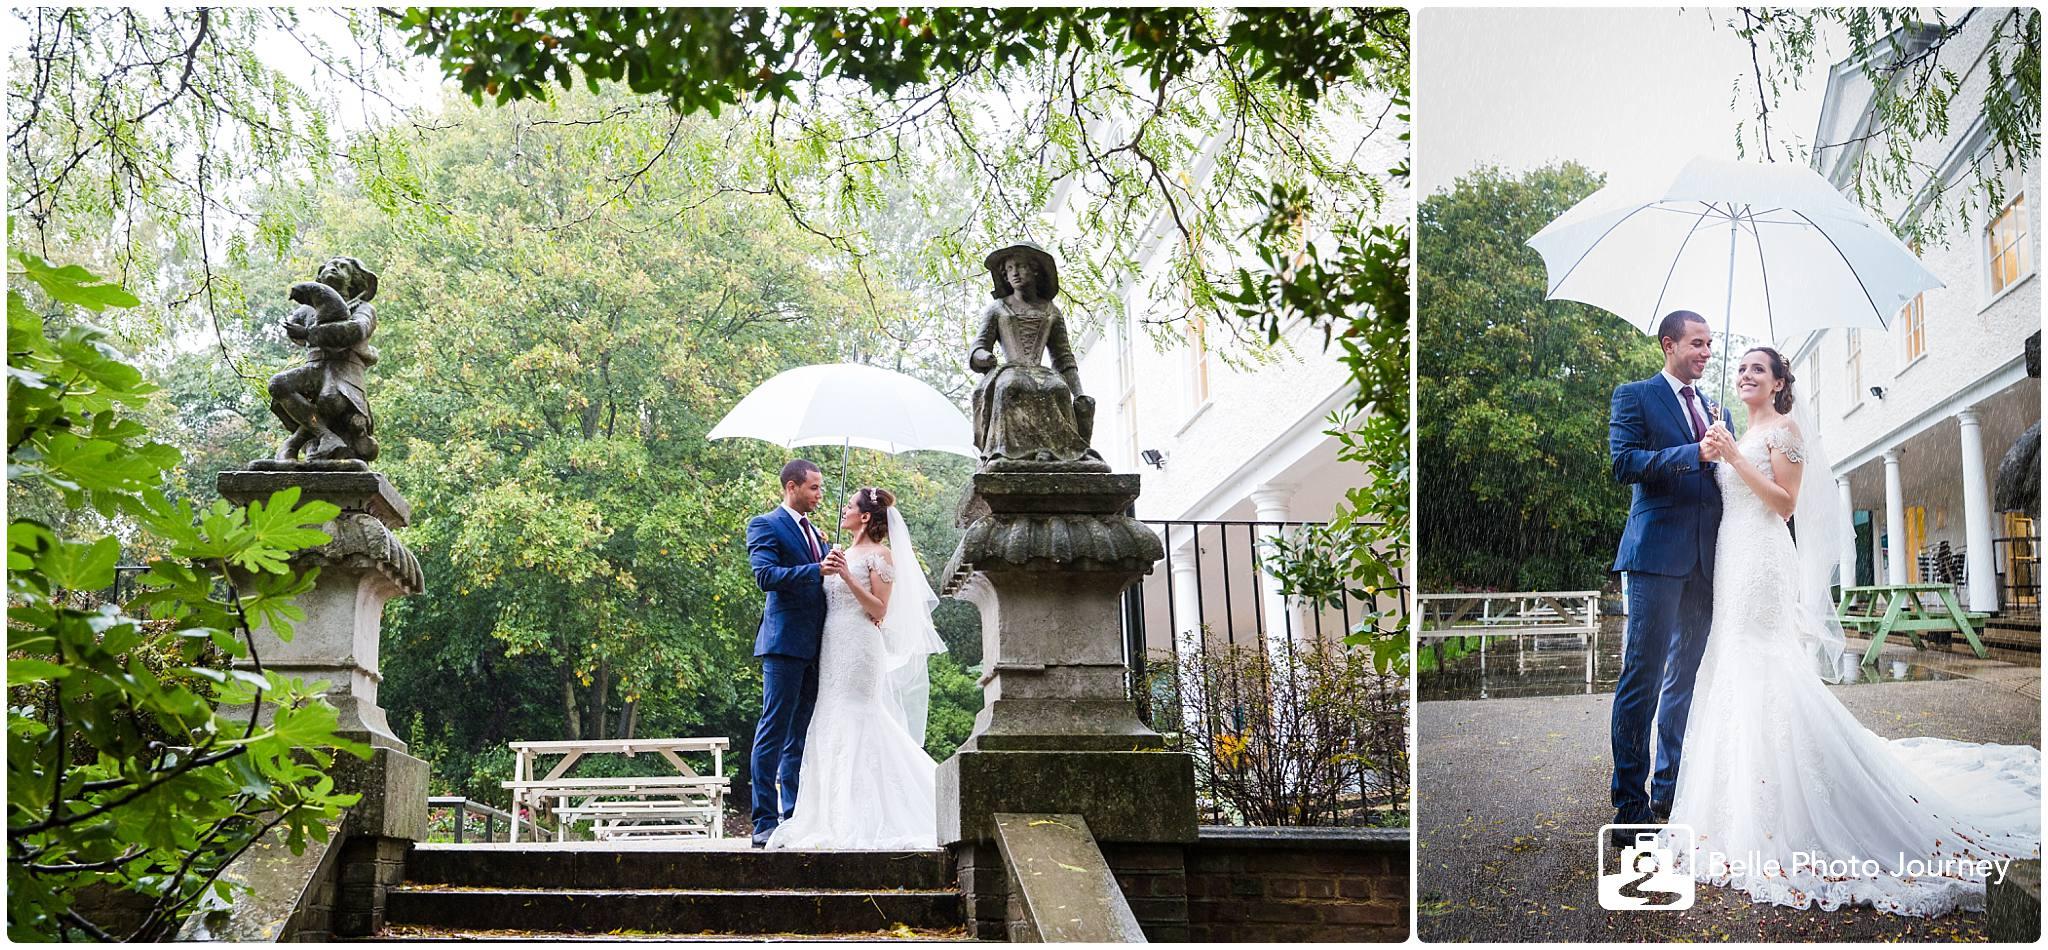 Wedding portrait in the rain private garden london photographer